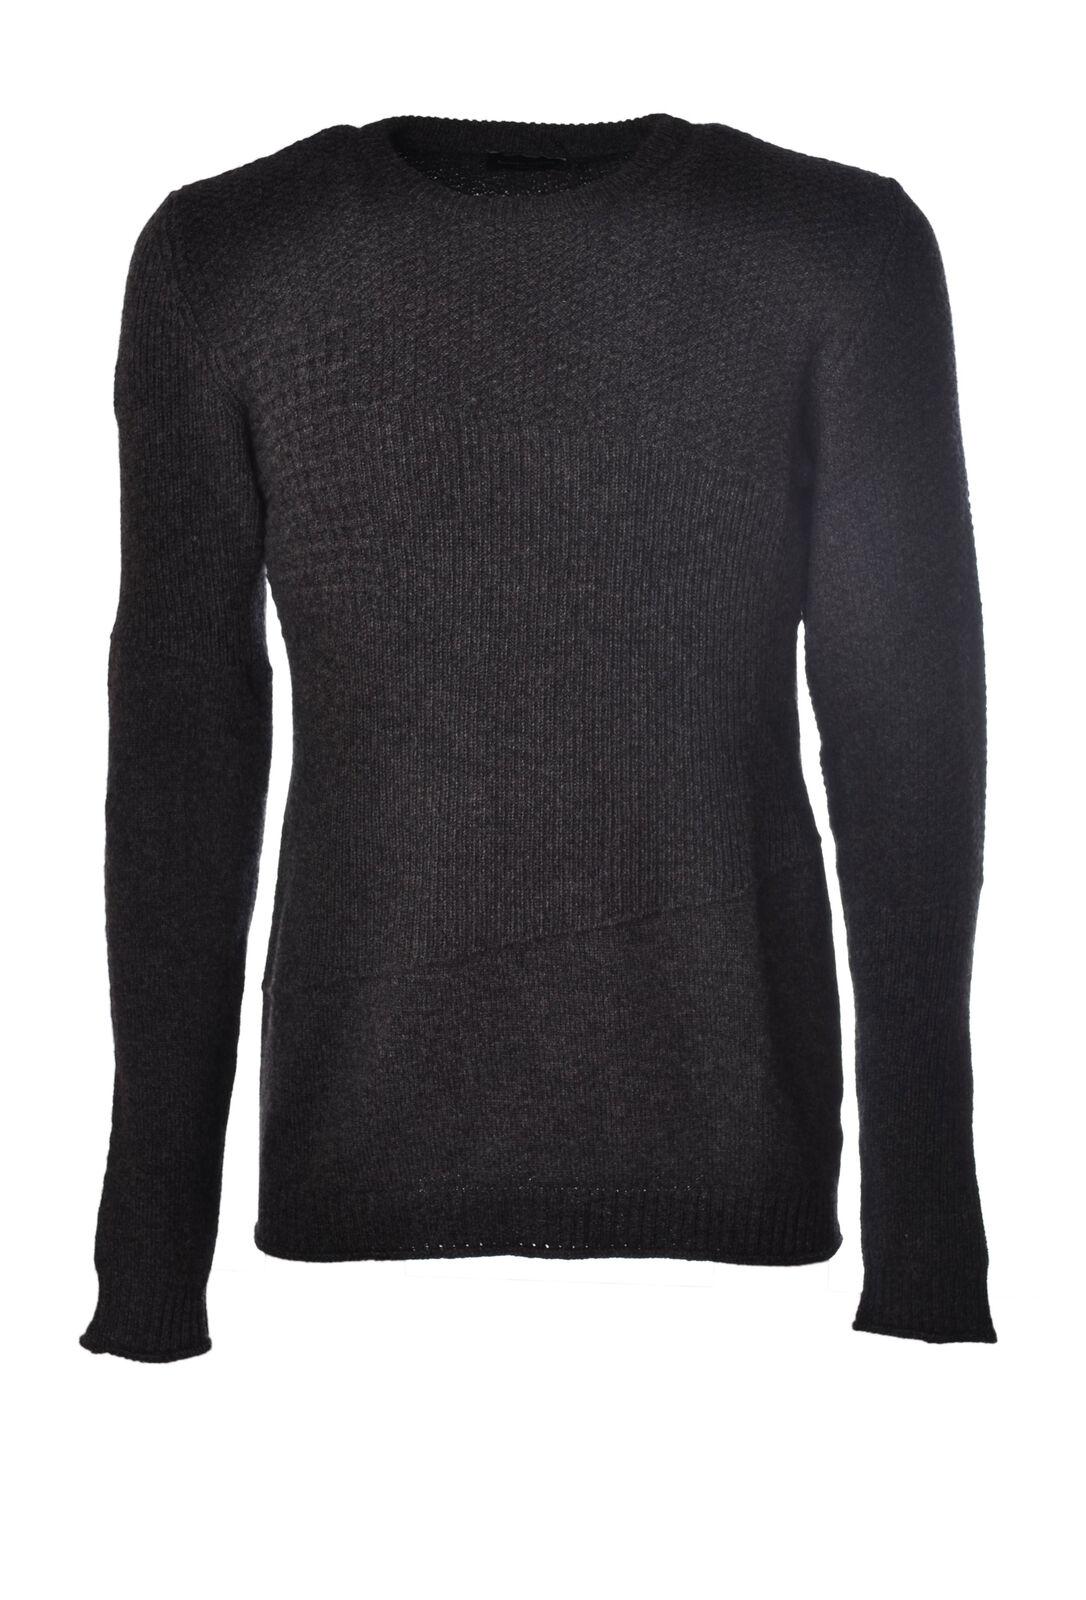 Roberto Collina  -  Sweaters - Male - Grau - 3984631A180939